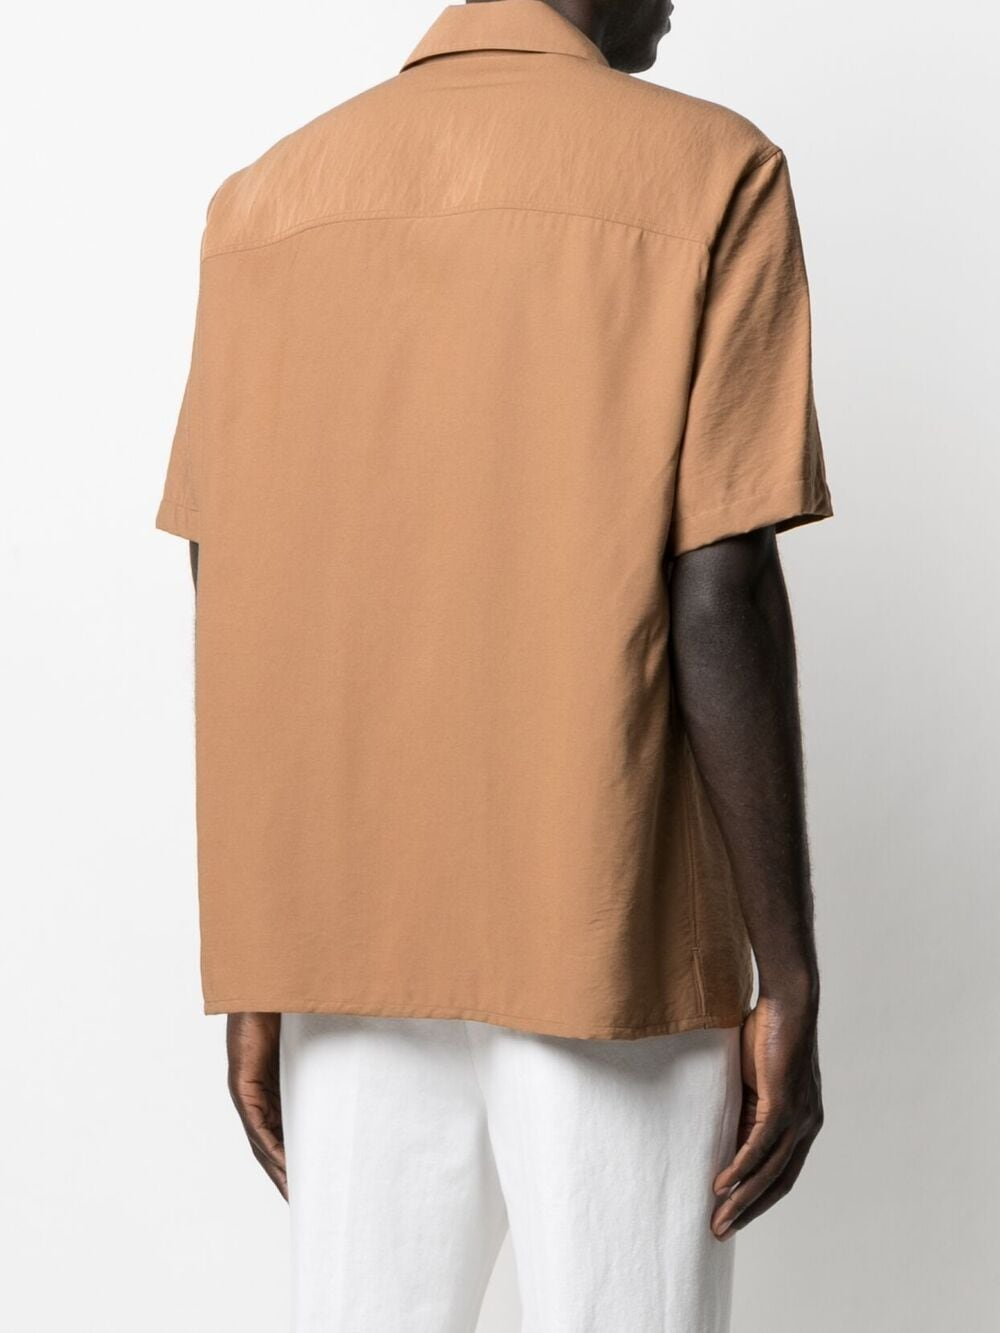 Ami Alexandre Mattiussi embroidered logo shirt man brown AMI - ALEXANDRE MATTIUSSI | Shirts | E21HC200.452250